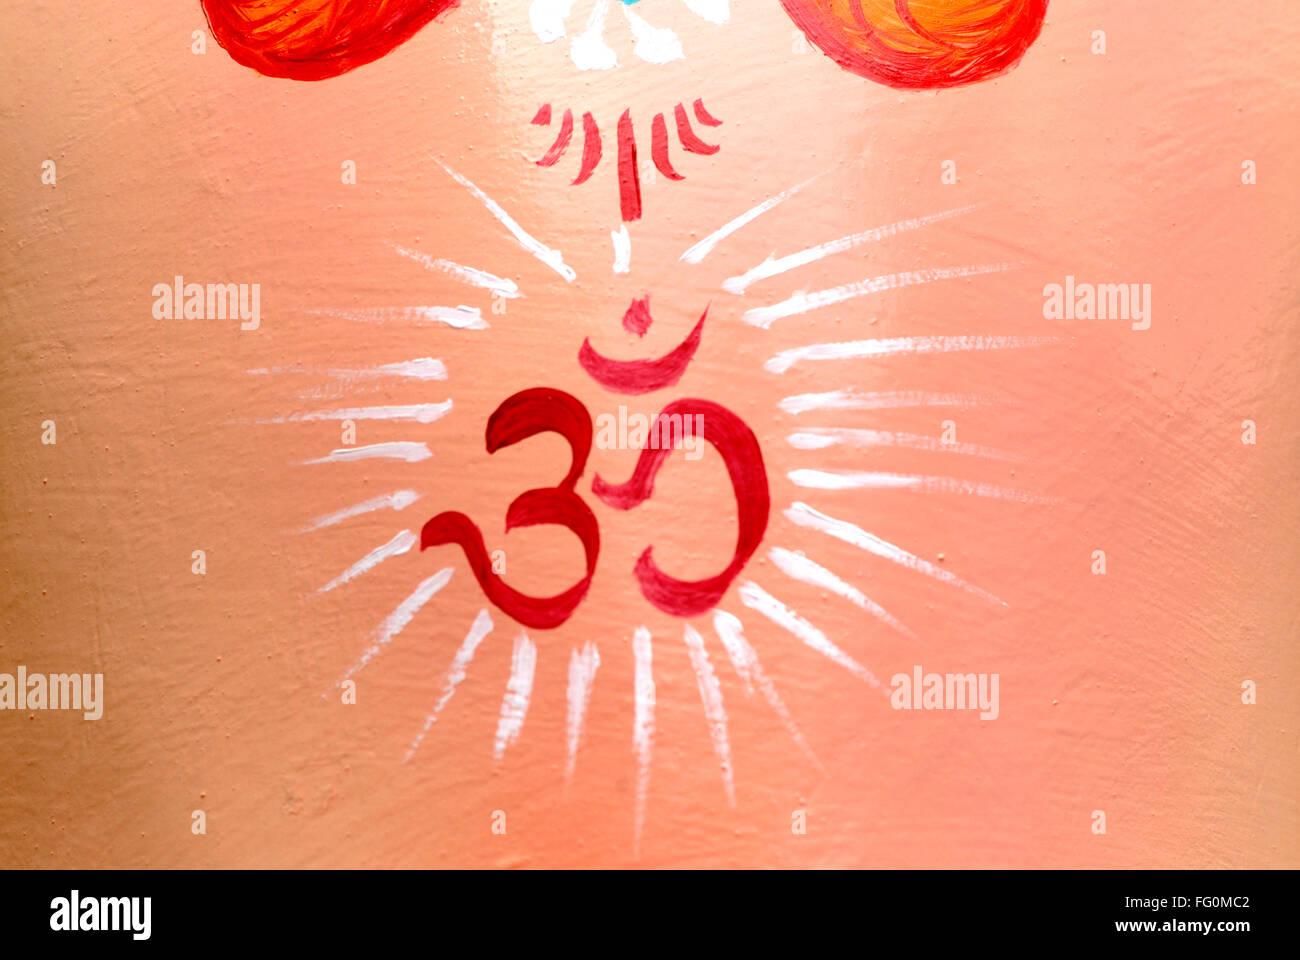 Hindu symbol on forehead stock photos hindu symbol on forehead om symbol painted on forehead of idol lord ganesh elephant headed god ganpati festival lalbaug bombay biocorpaavc